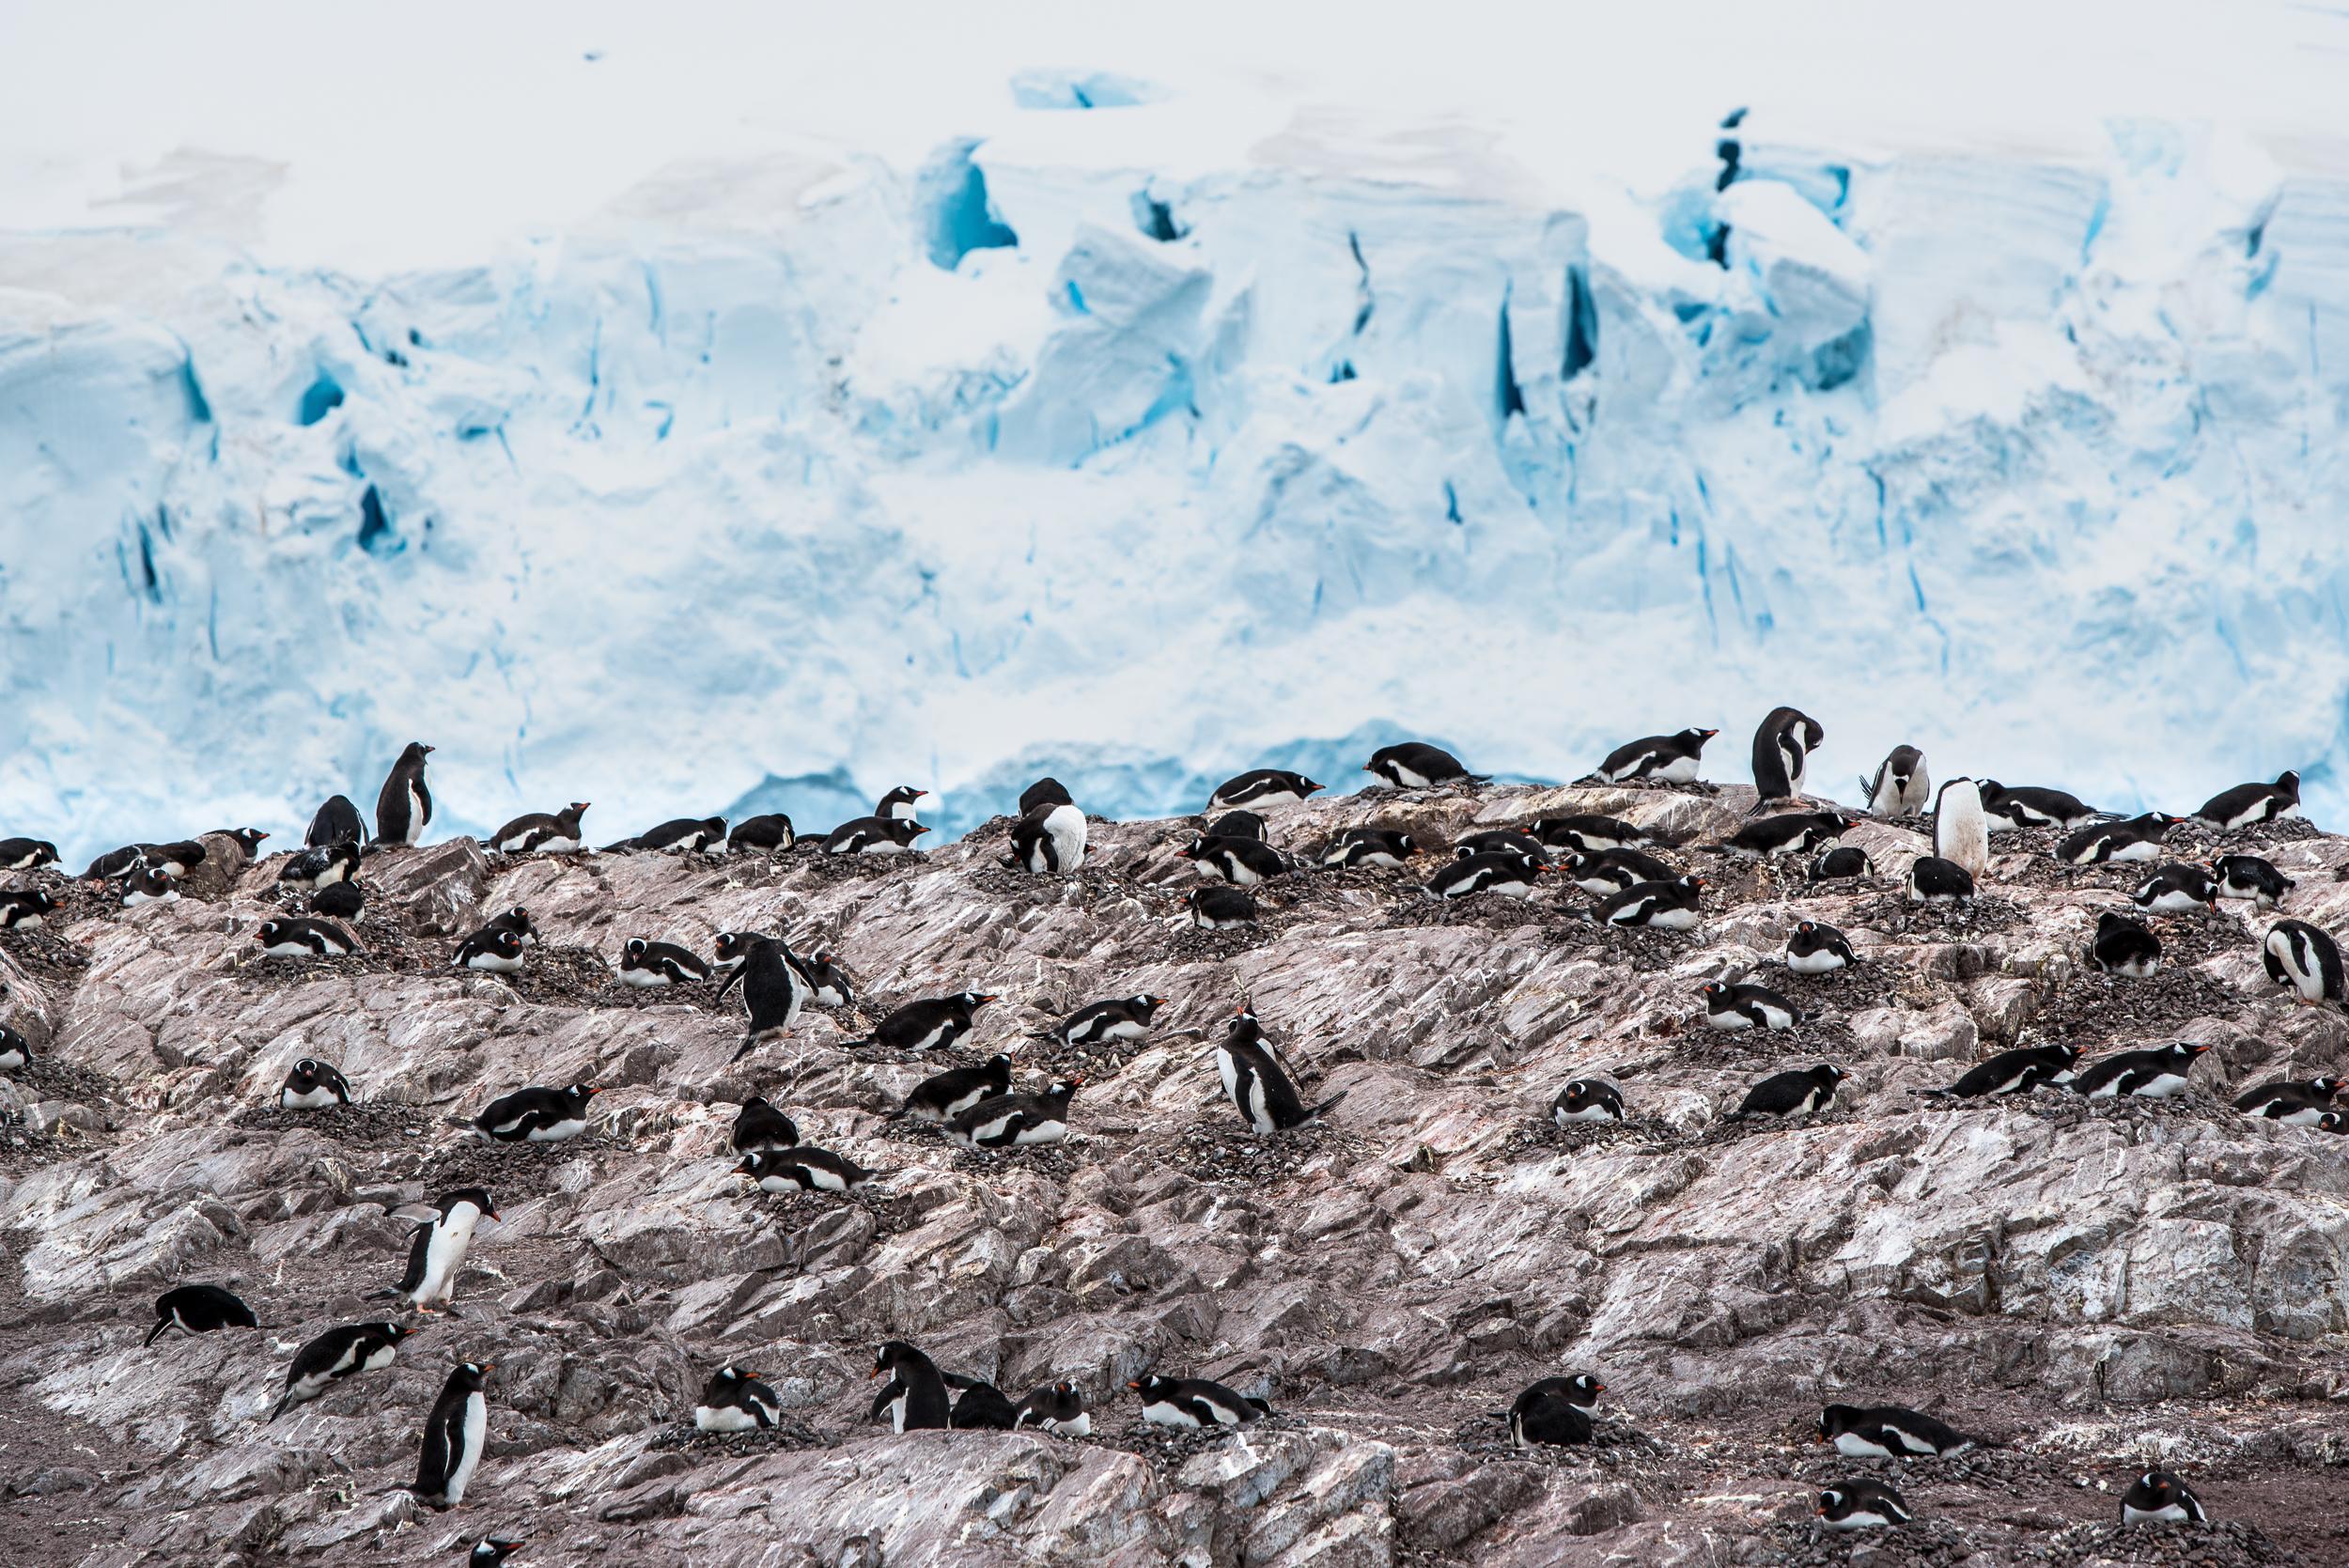 joe-thomas-photo-antarctica-travel-new-york-photographer-13.jpg